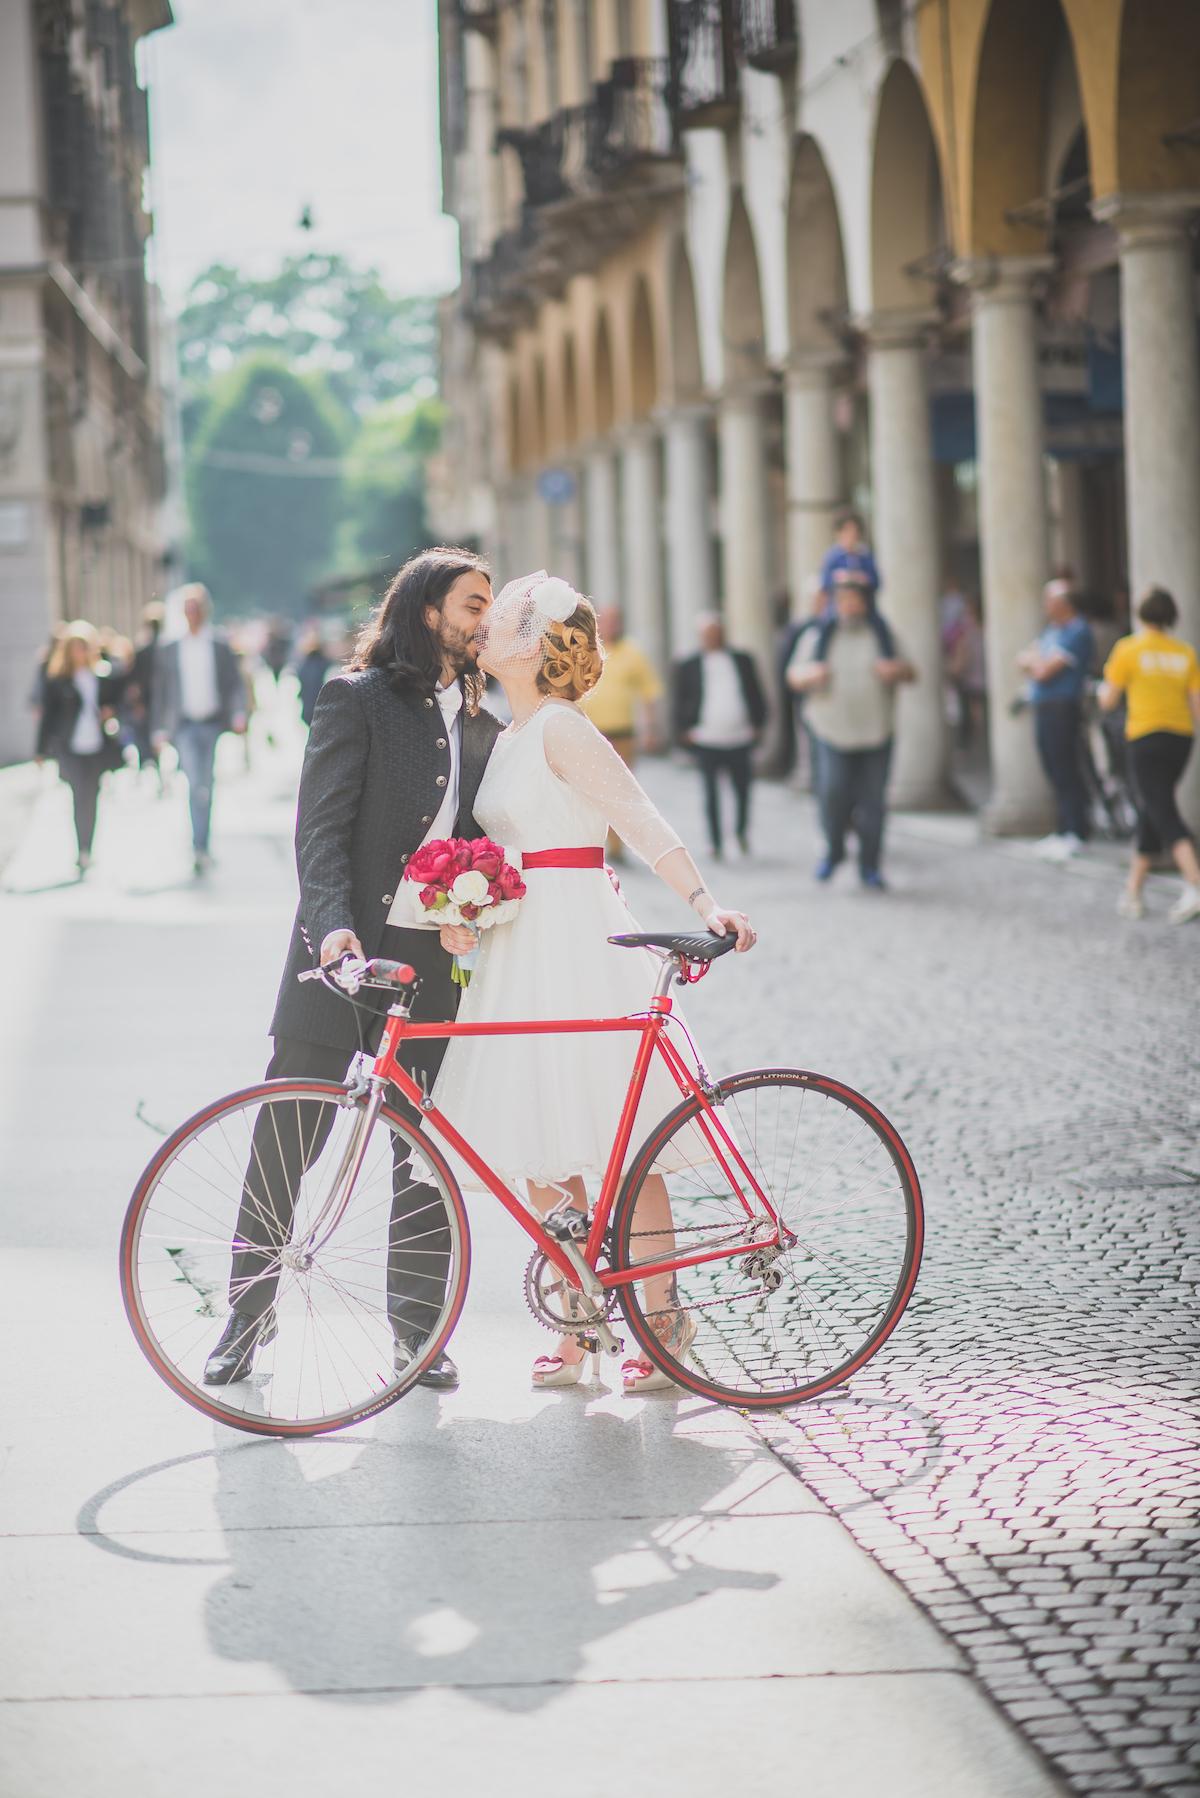 matrimonio-rockabilly-anni-50-matrimonio-adhoc-wedding-wonderland-11